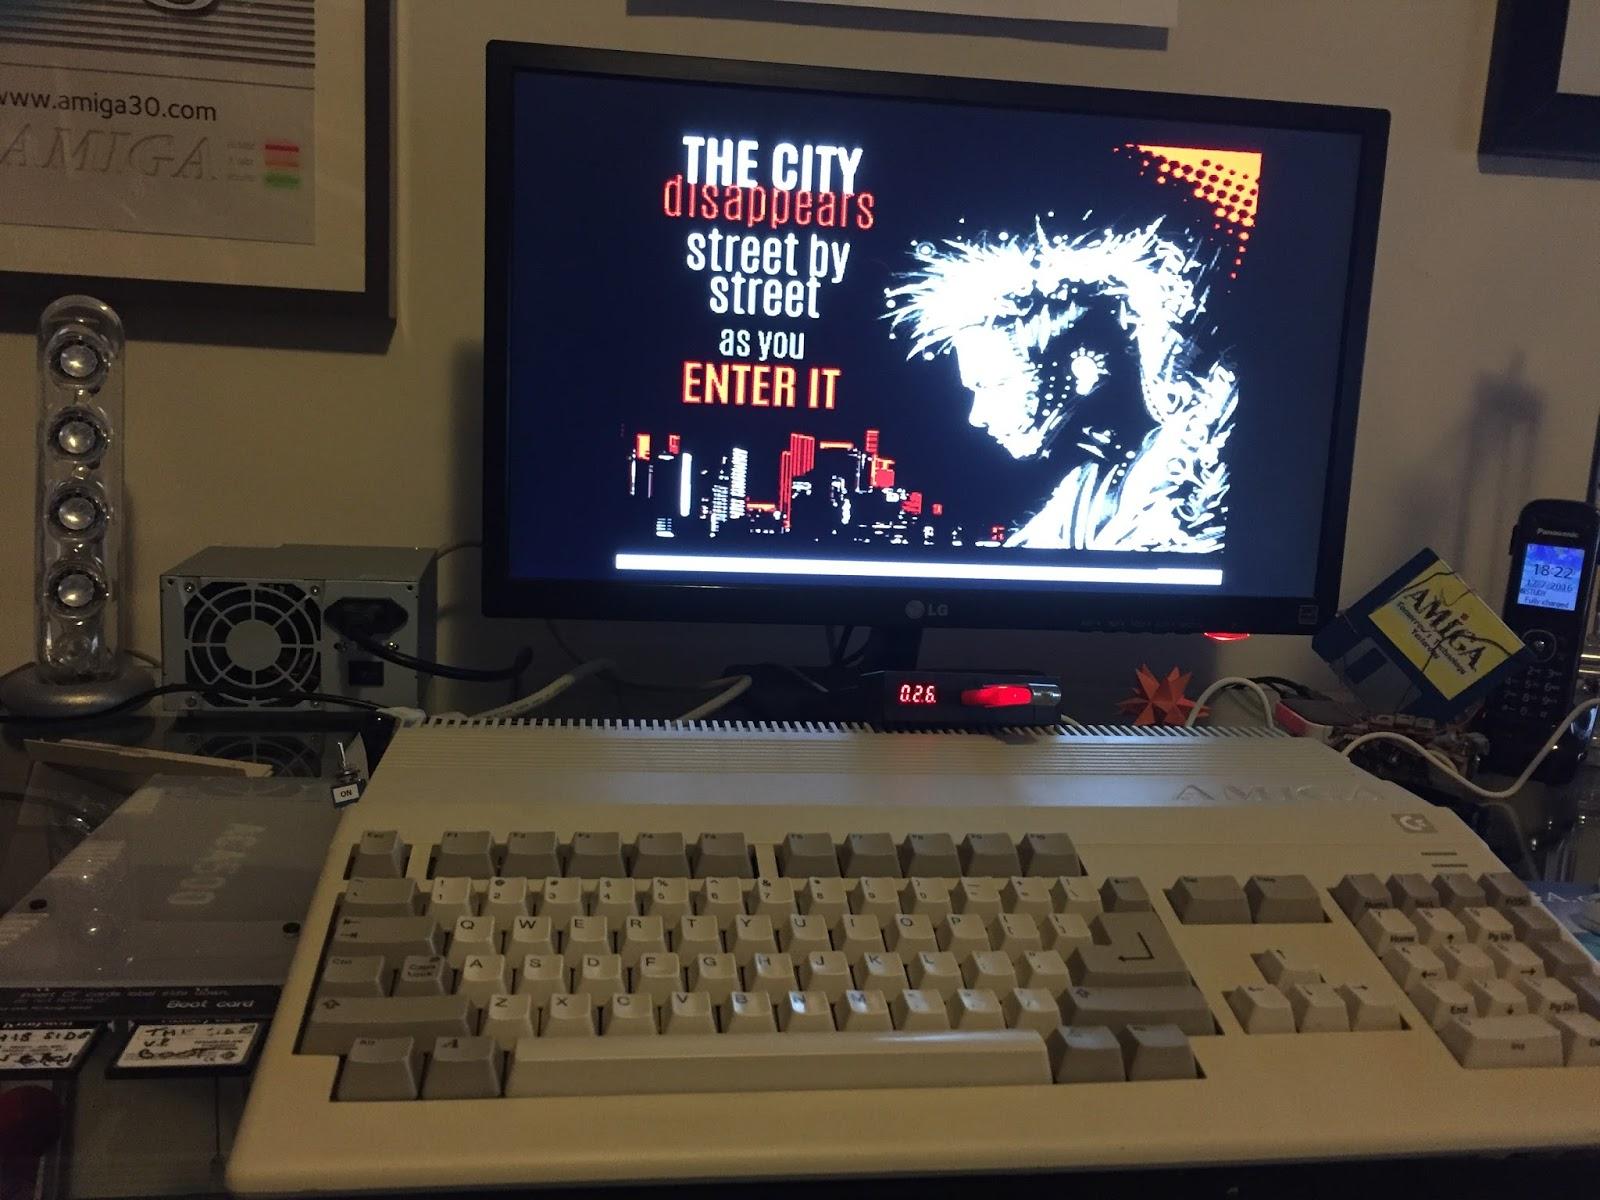 Epsilon's Amiga Blog: DF0 Selector on Amiga 500